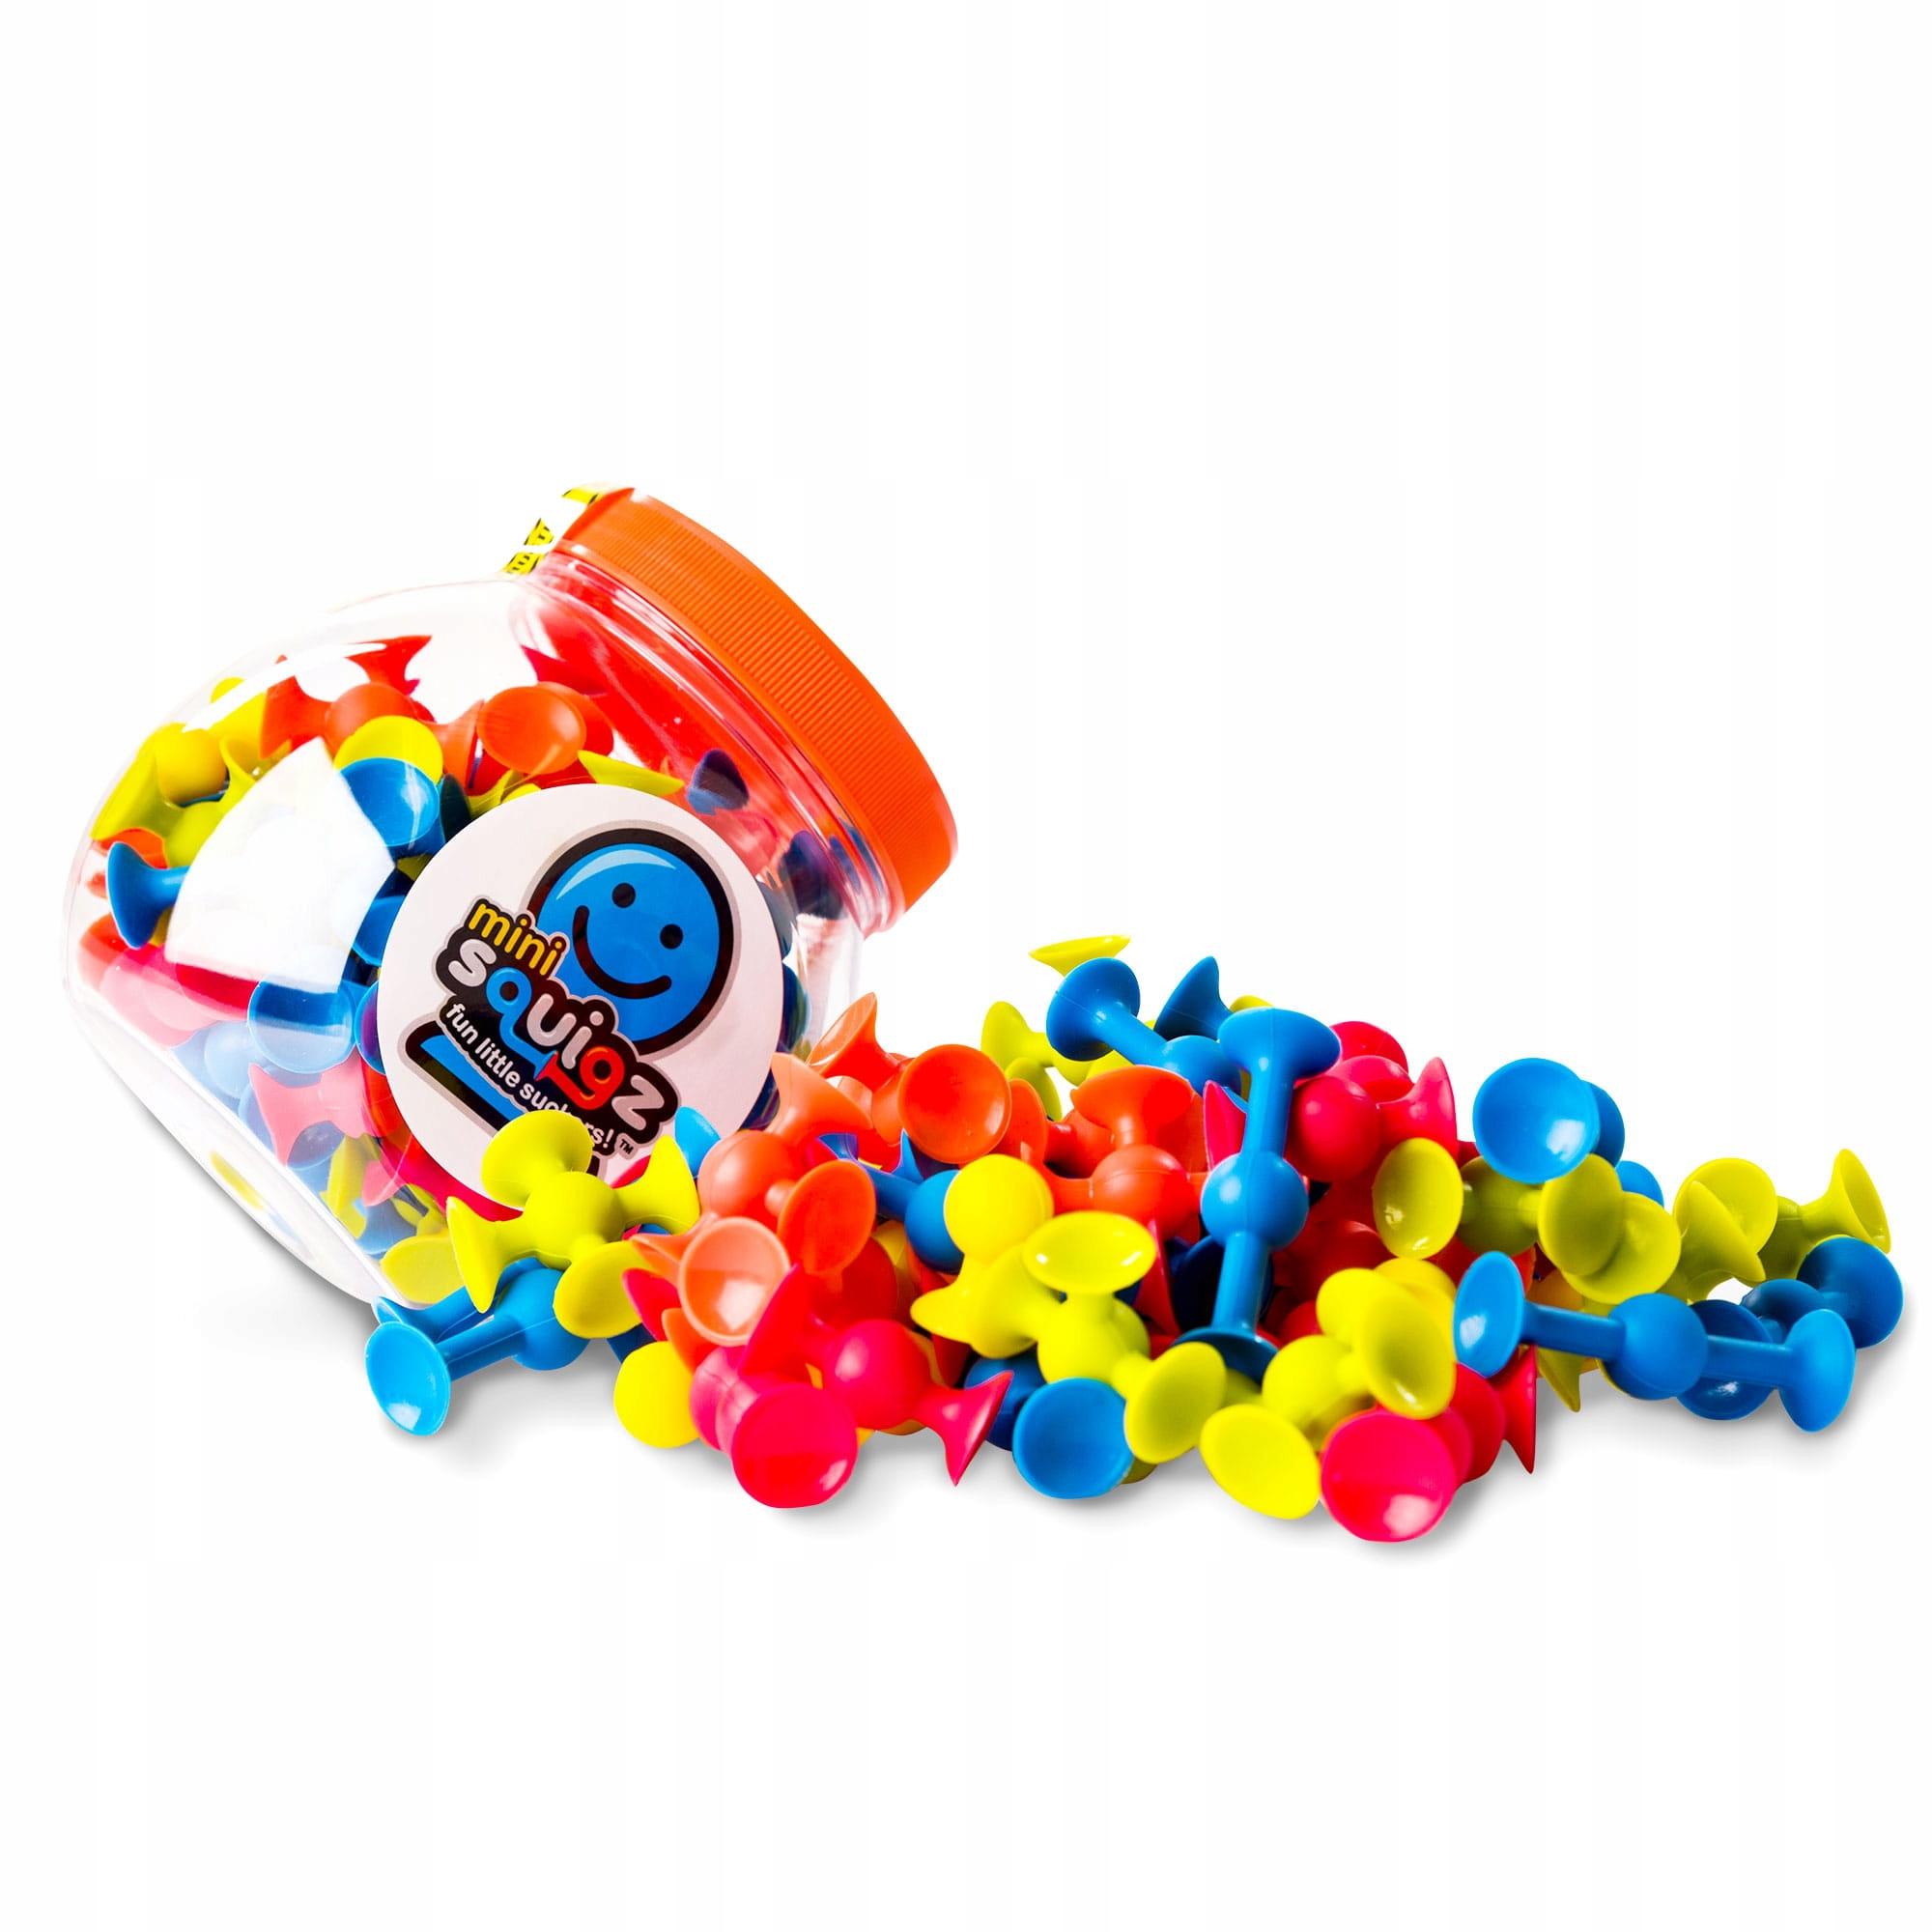 Fat Brain Toys Mini Squigz Przyssawki 75El, FA107 Marka Fat Brain Toys